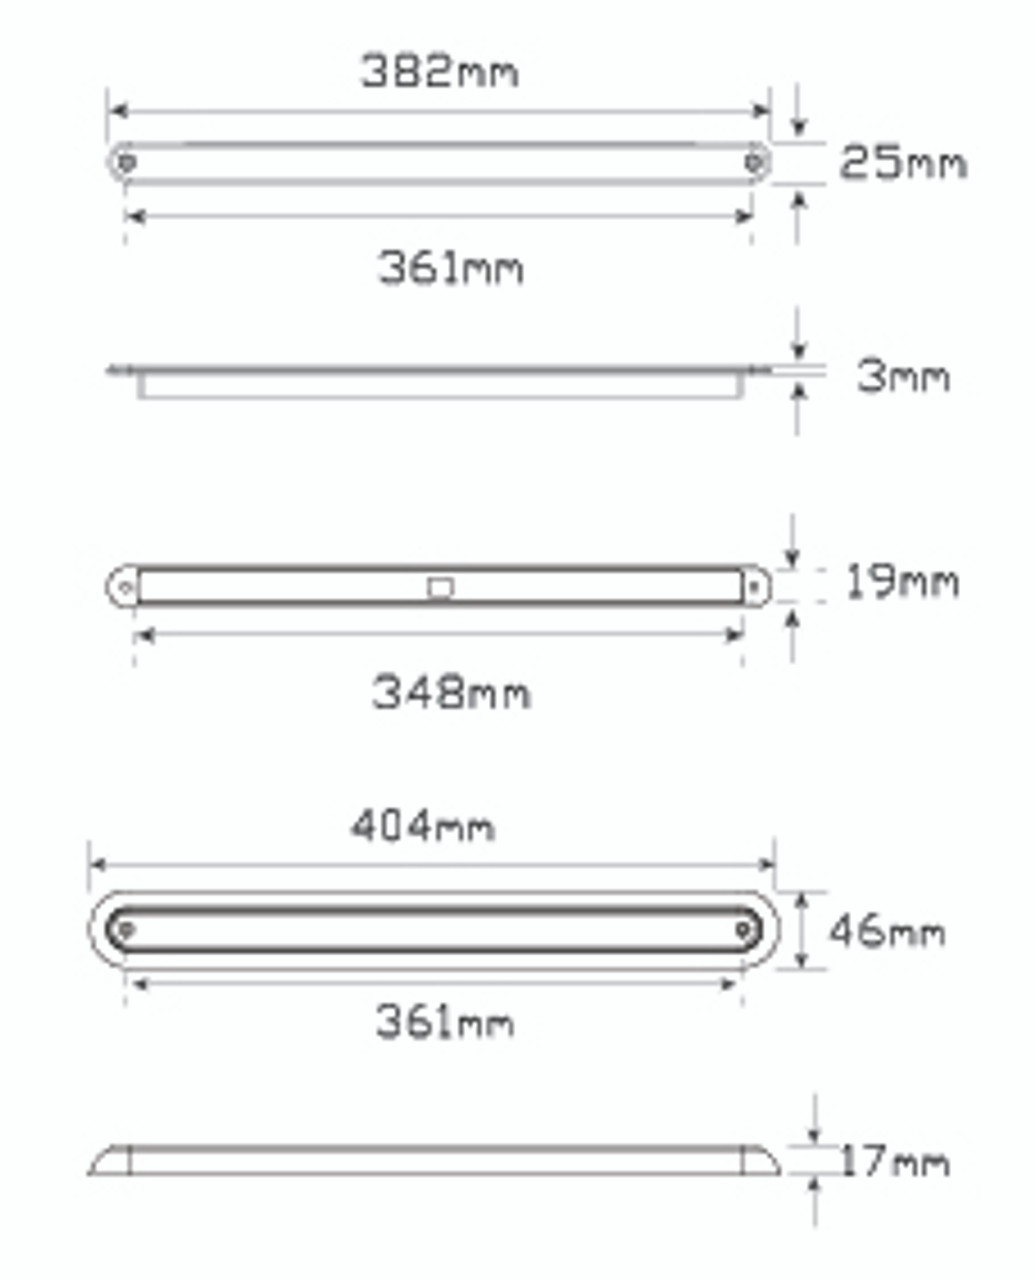 Line Drawing - 380CA12 - Rear Indicator Strip Light. Low Profile. Slimline Design. Chrome Bracket. 12v Only. Single Pack. 5 Year Warranty. Autolamp. Ultimate LED.